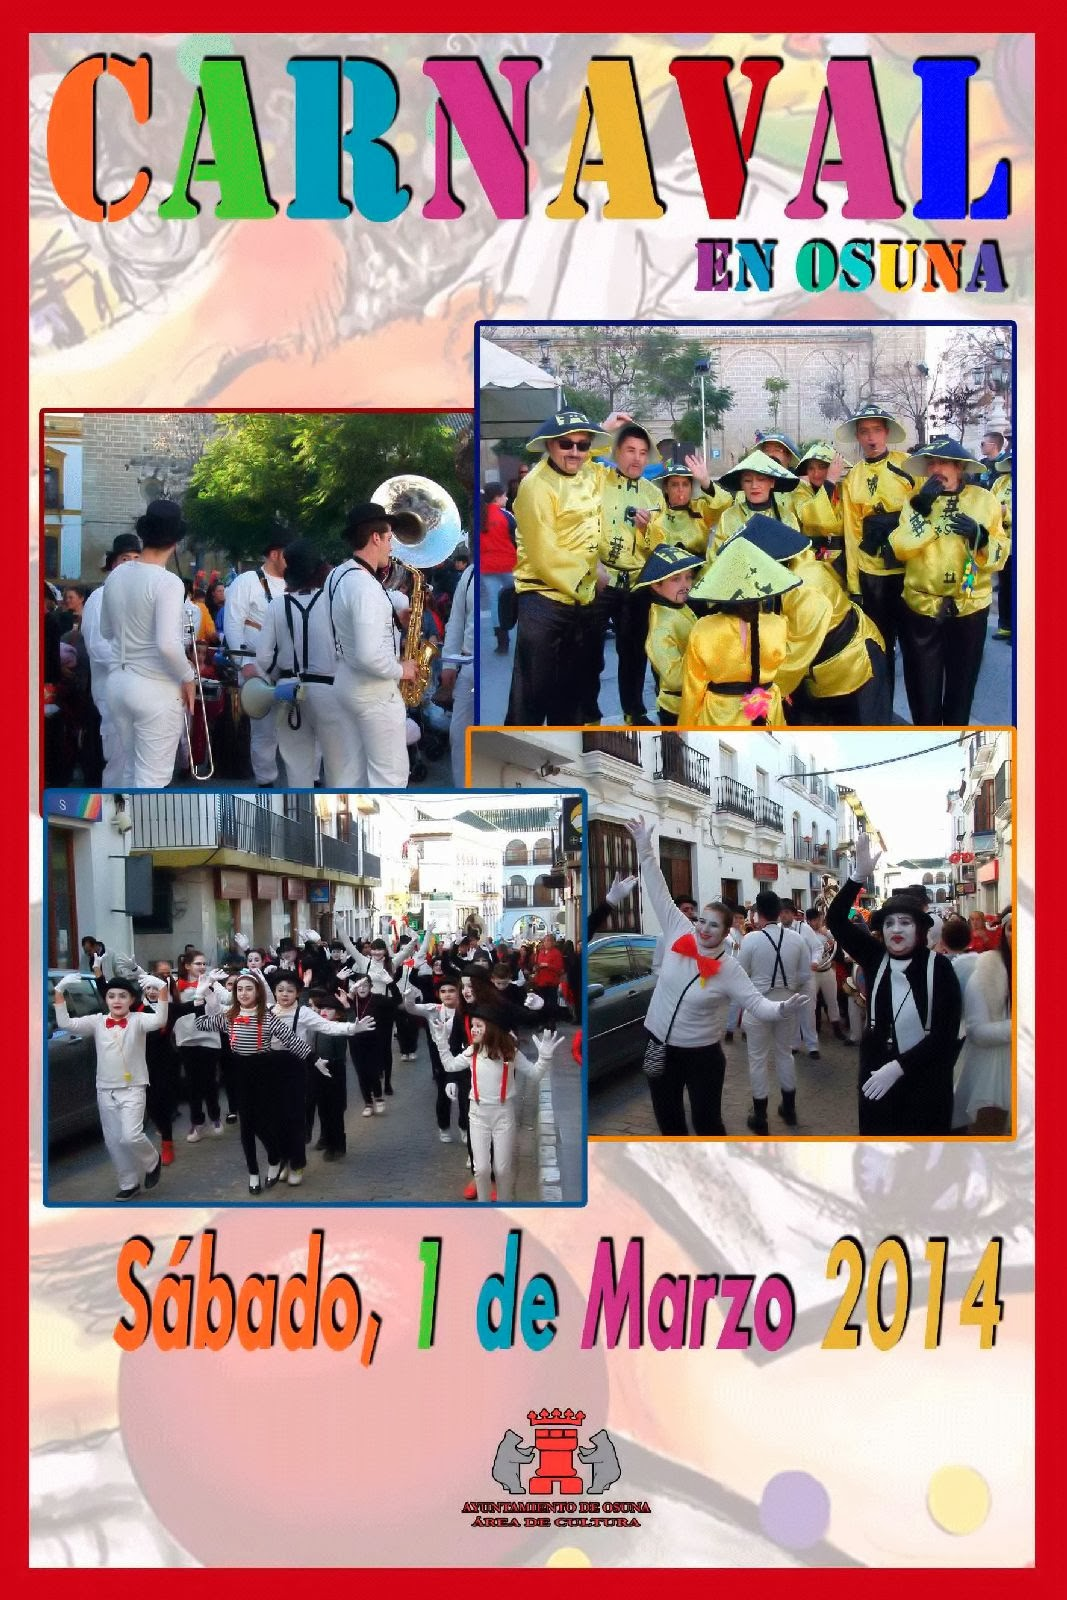 isabel gelves or sevilla valle gonzalez: